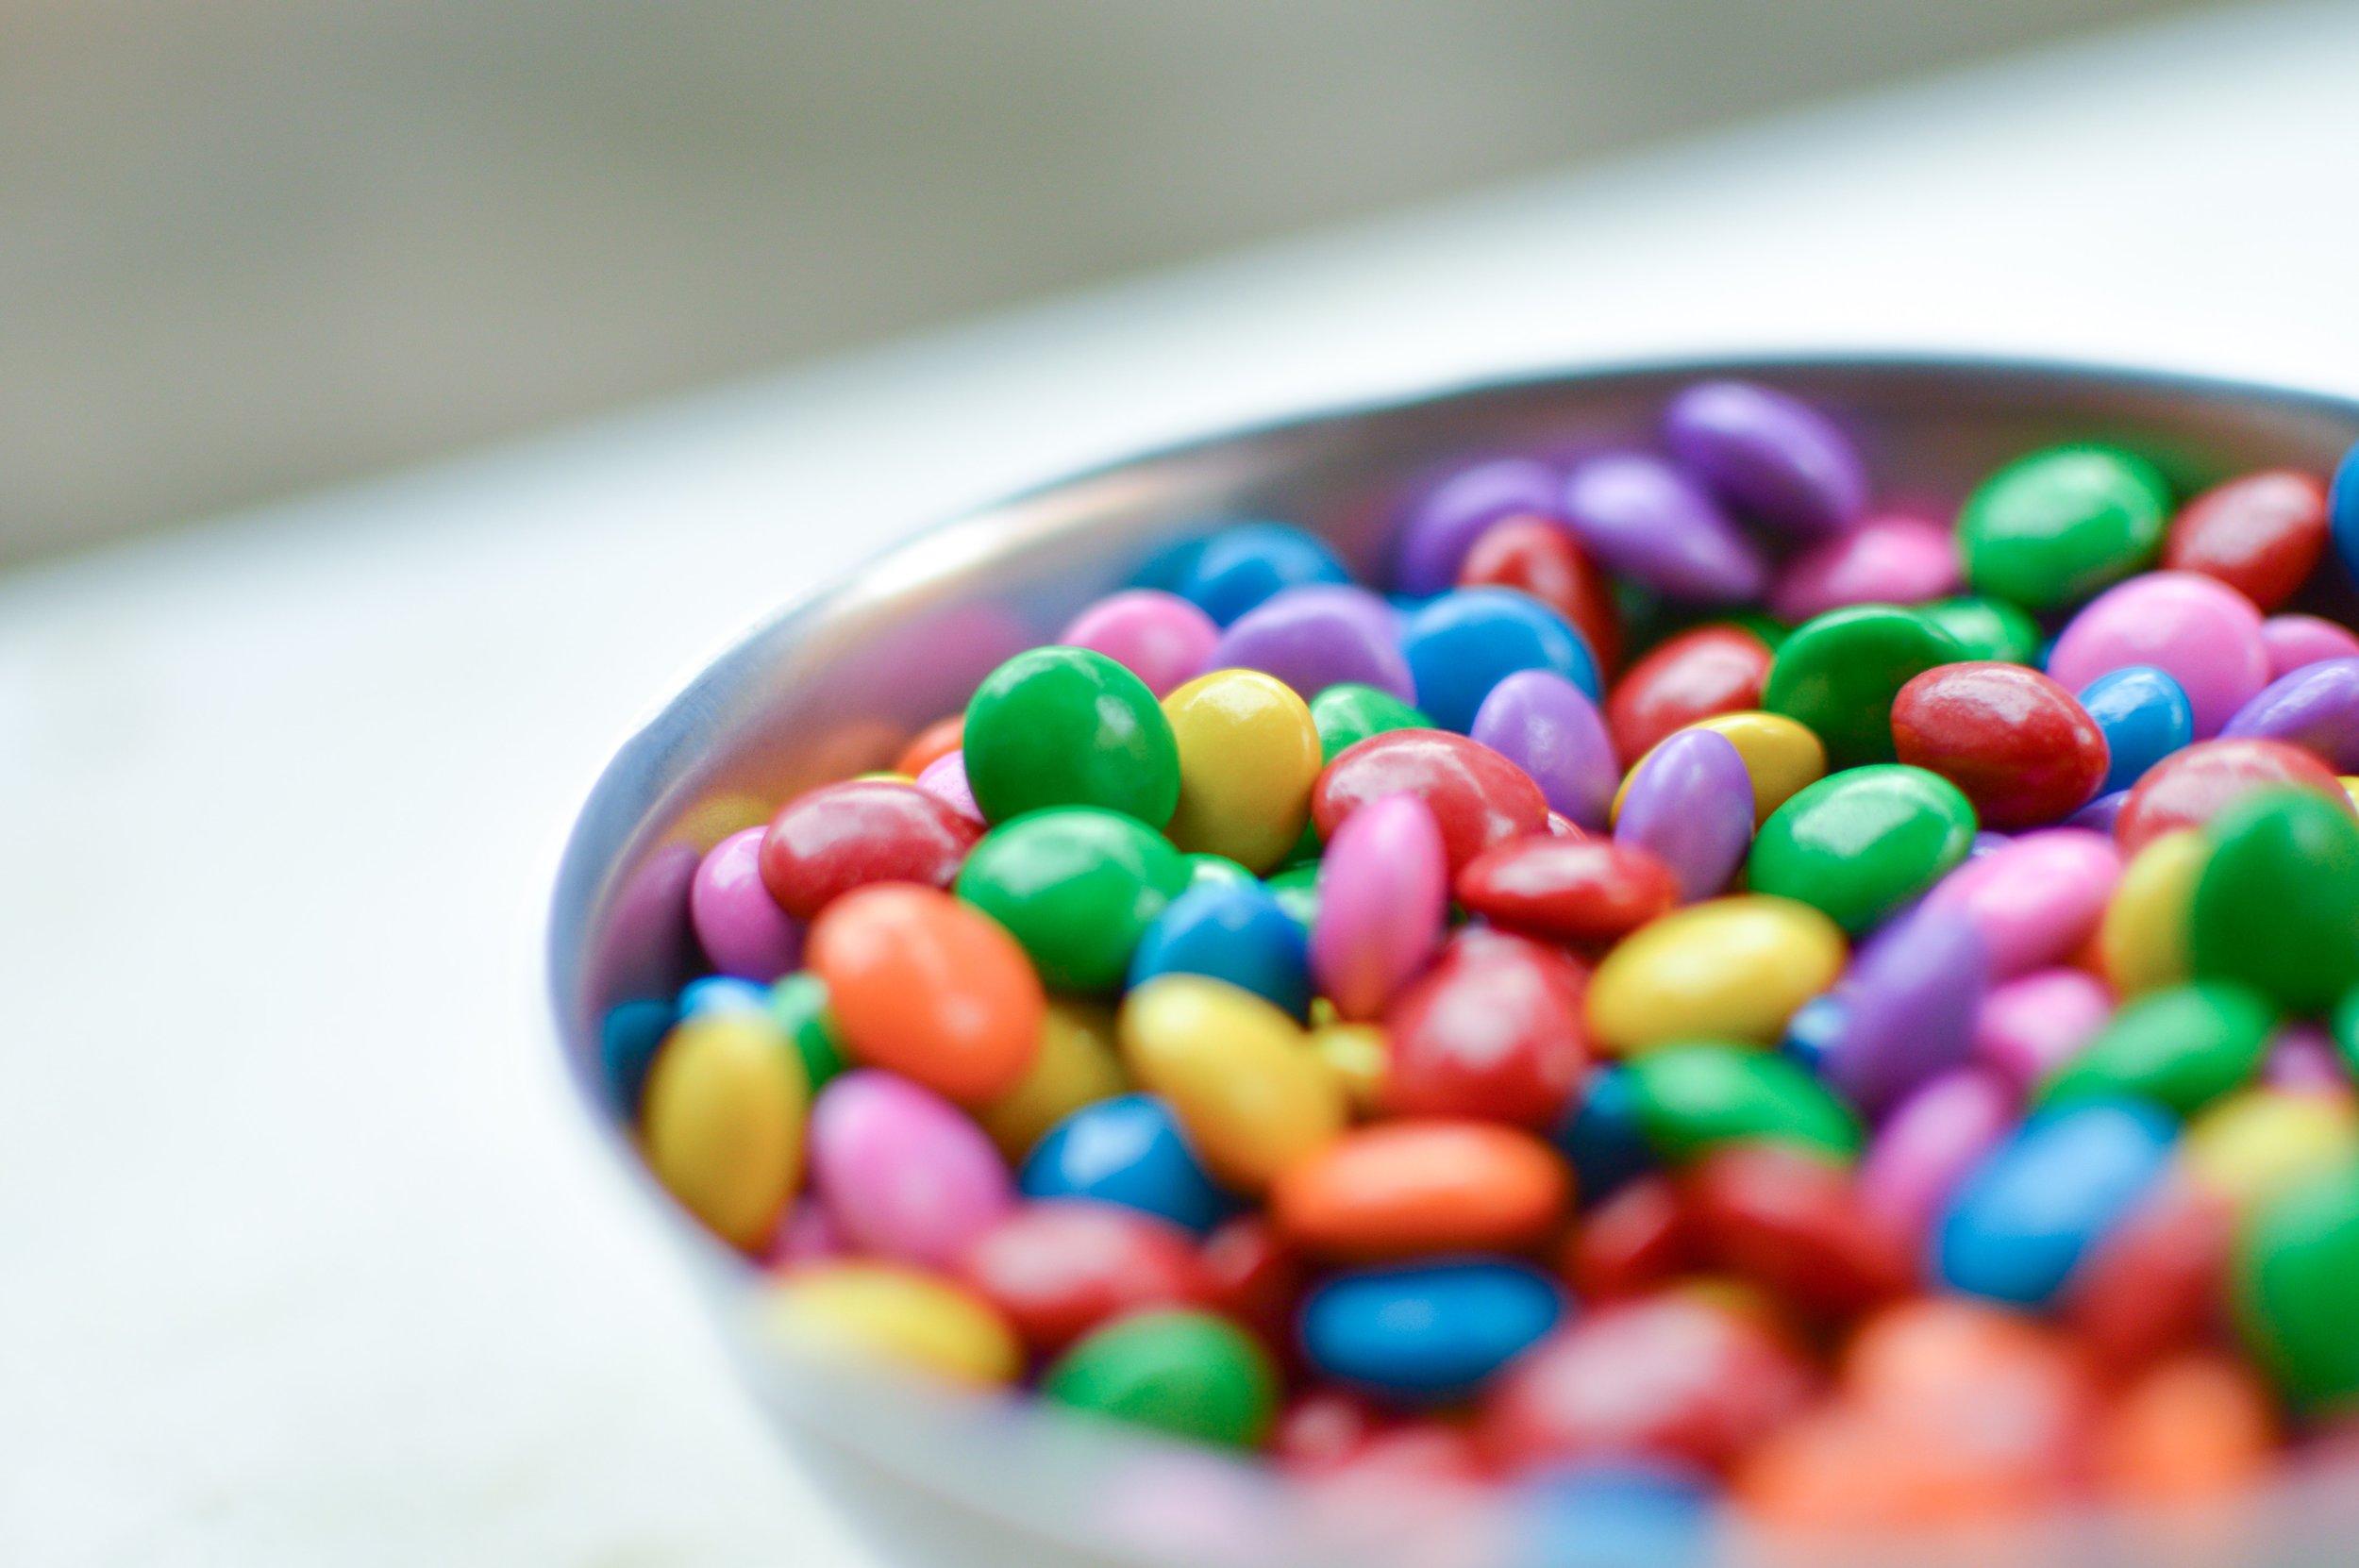 bowl-candy-chocolate-65547.jpg